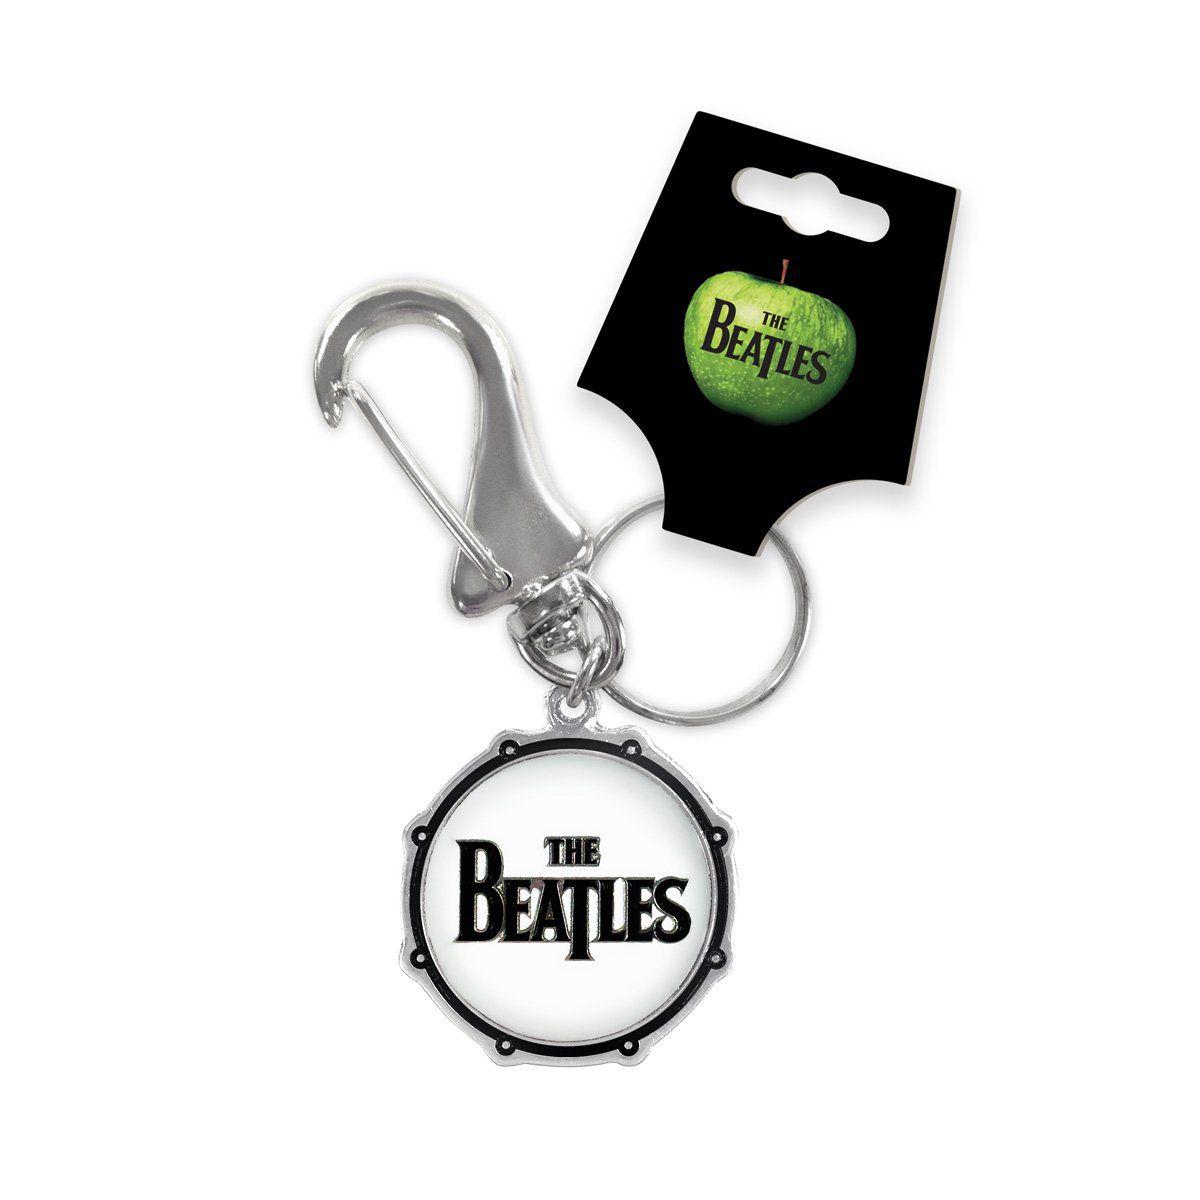 Chaveiro de Metal The Beatles Drum The Beatles  - bandUP Store Marketplace